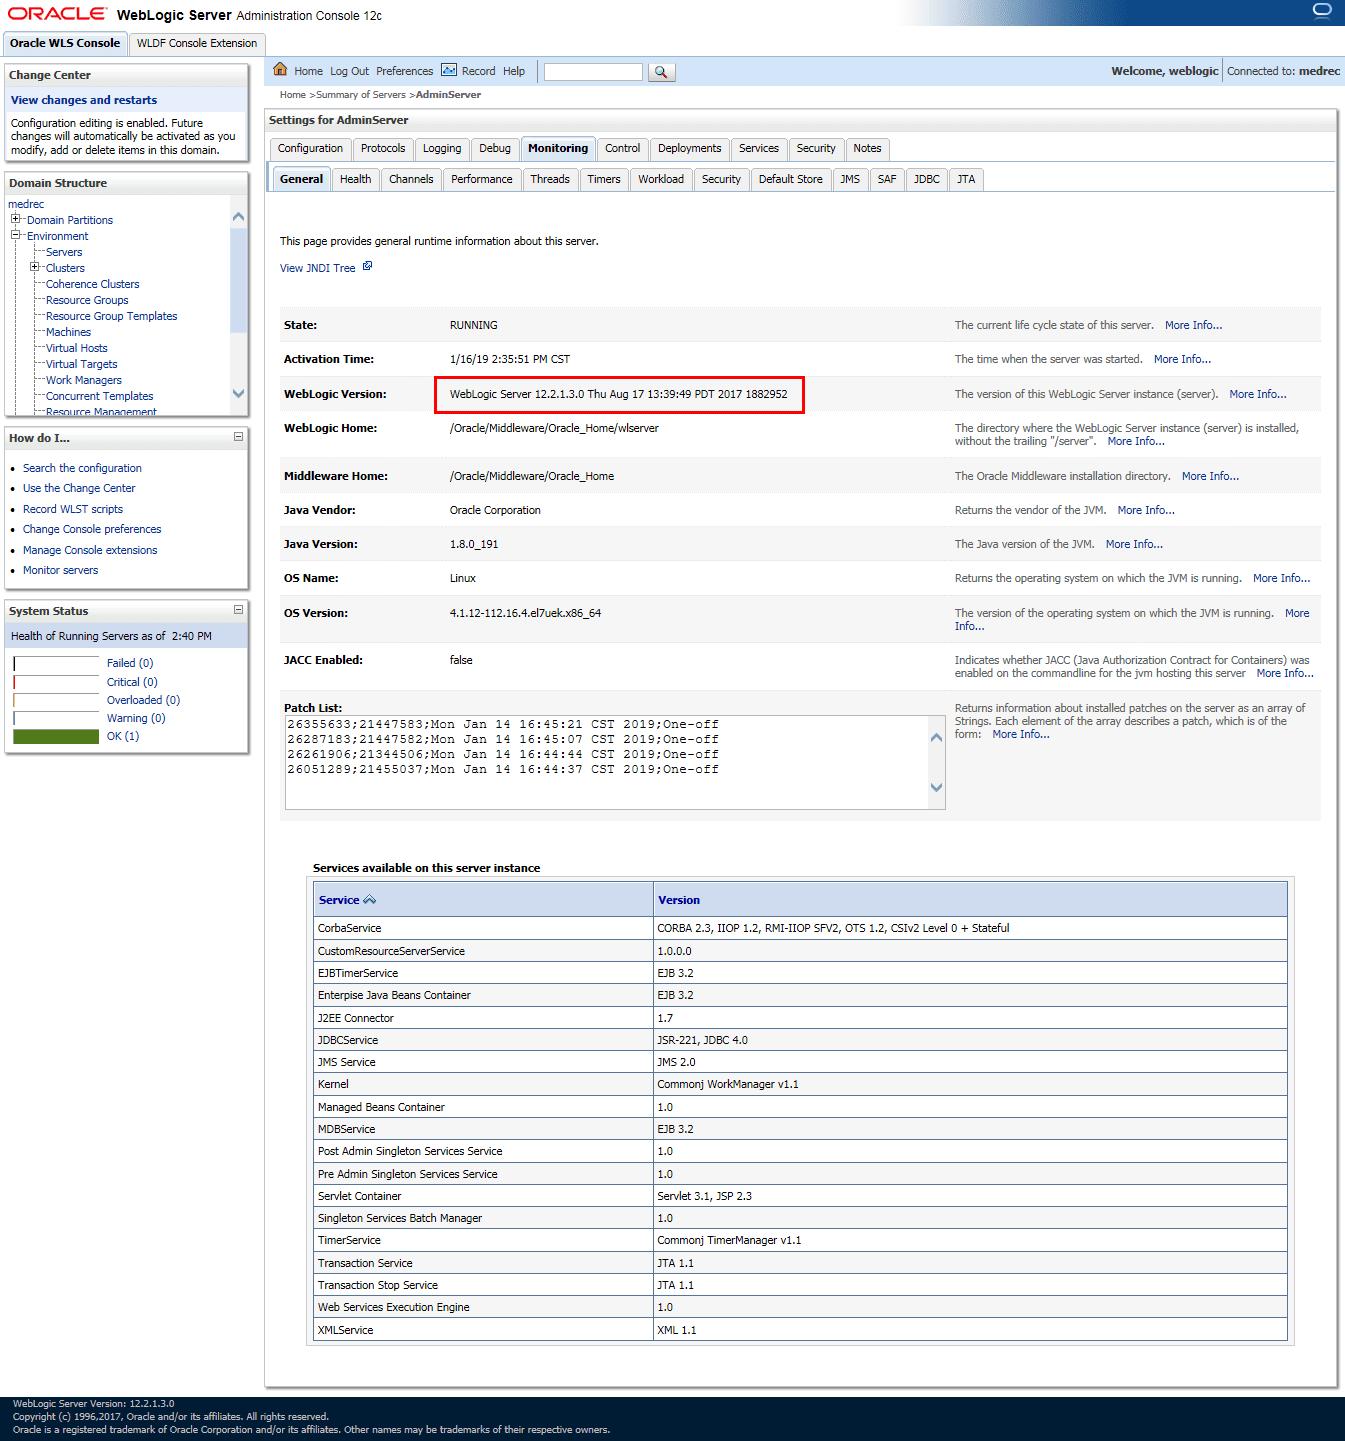 WebLogic Server Administration Console - Server Monitoring - General Tab